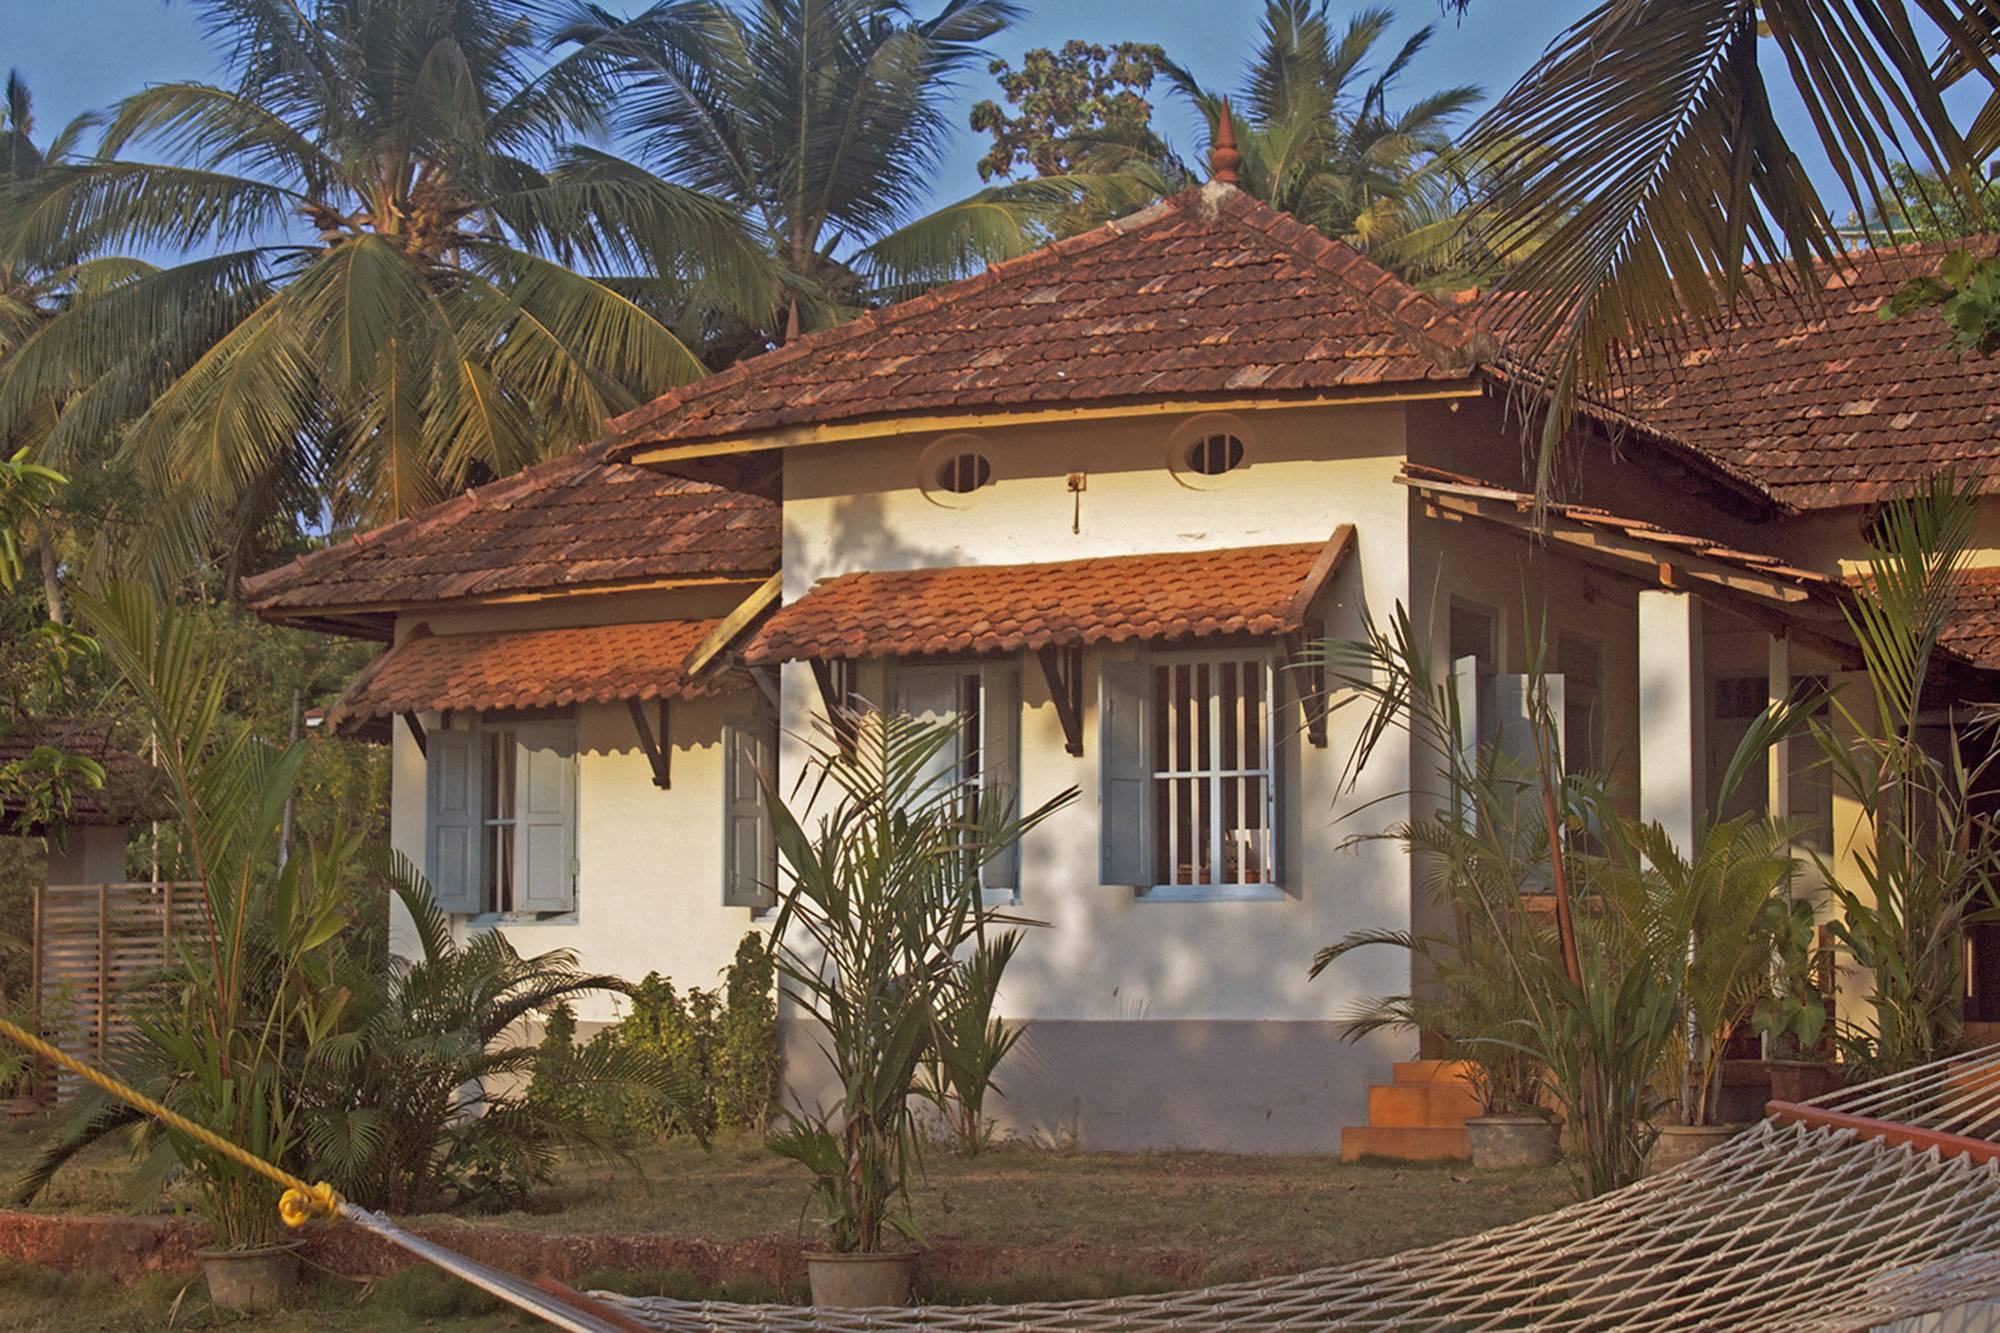 https://www.soulandsurf.com/wp-content/uploads/2021/09/Retreatsindia-images-SoulSurf-3.jpg